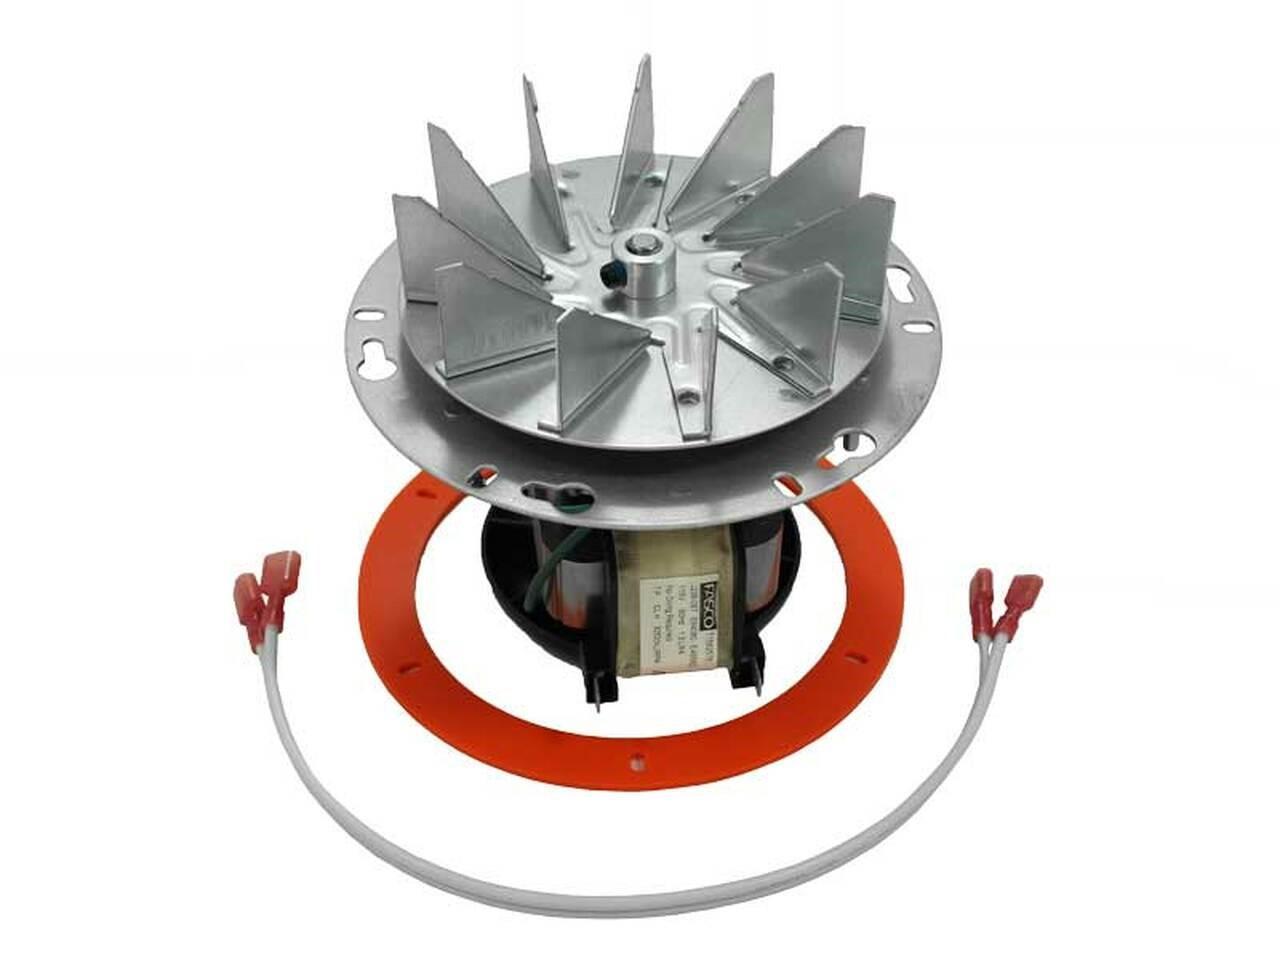 us stove ashley vogelzang combustion exhaust motor 80602